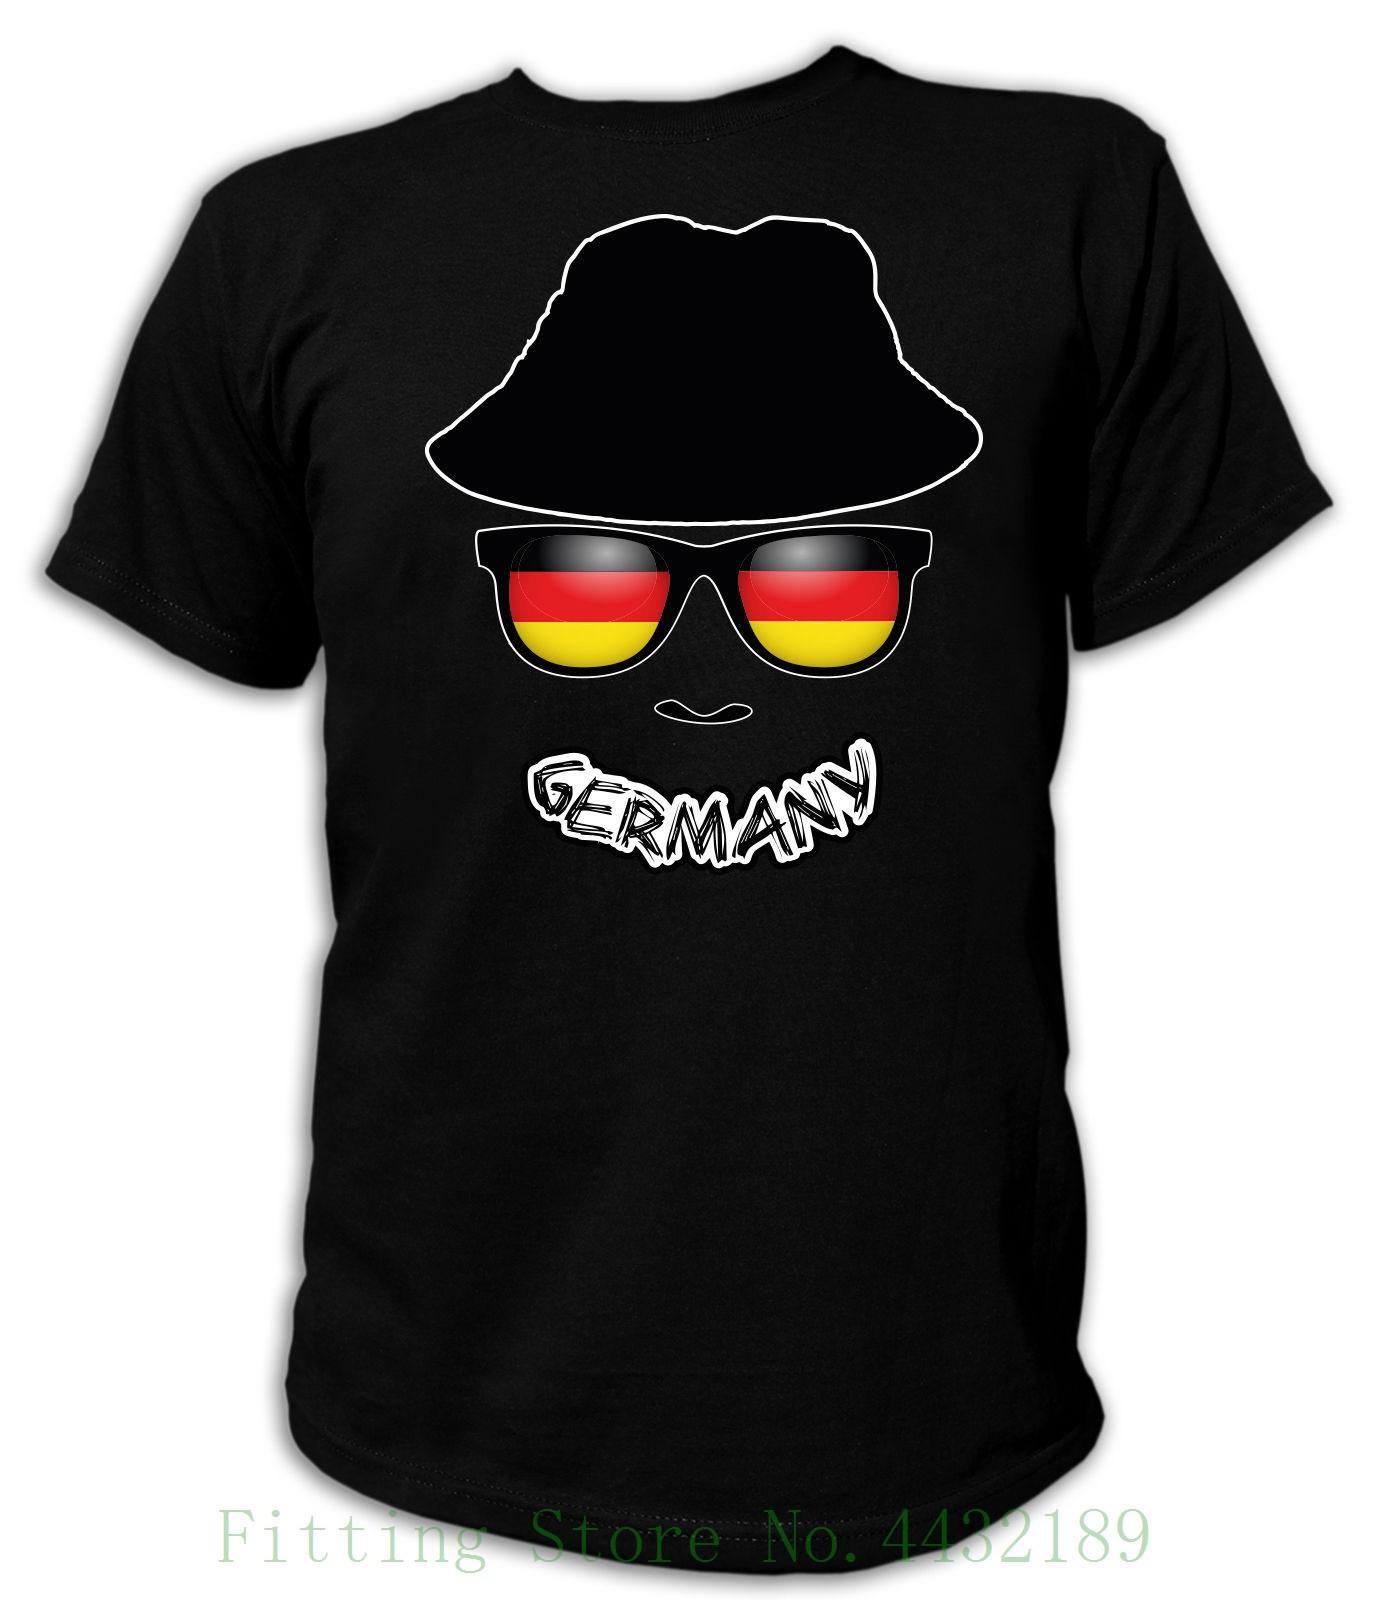 c6aaba12ddda4 Compre Camiseta Bandeira Do Crânio Do Fã Fahne Deutschland Ger Alemanha  Allemagne D Fu  A Bola Soccerite Cobre A Camisa Legal De T De  Aaa888tshirts